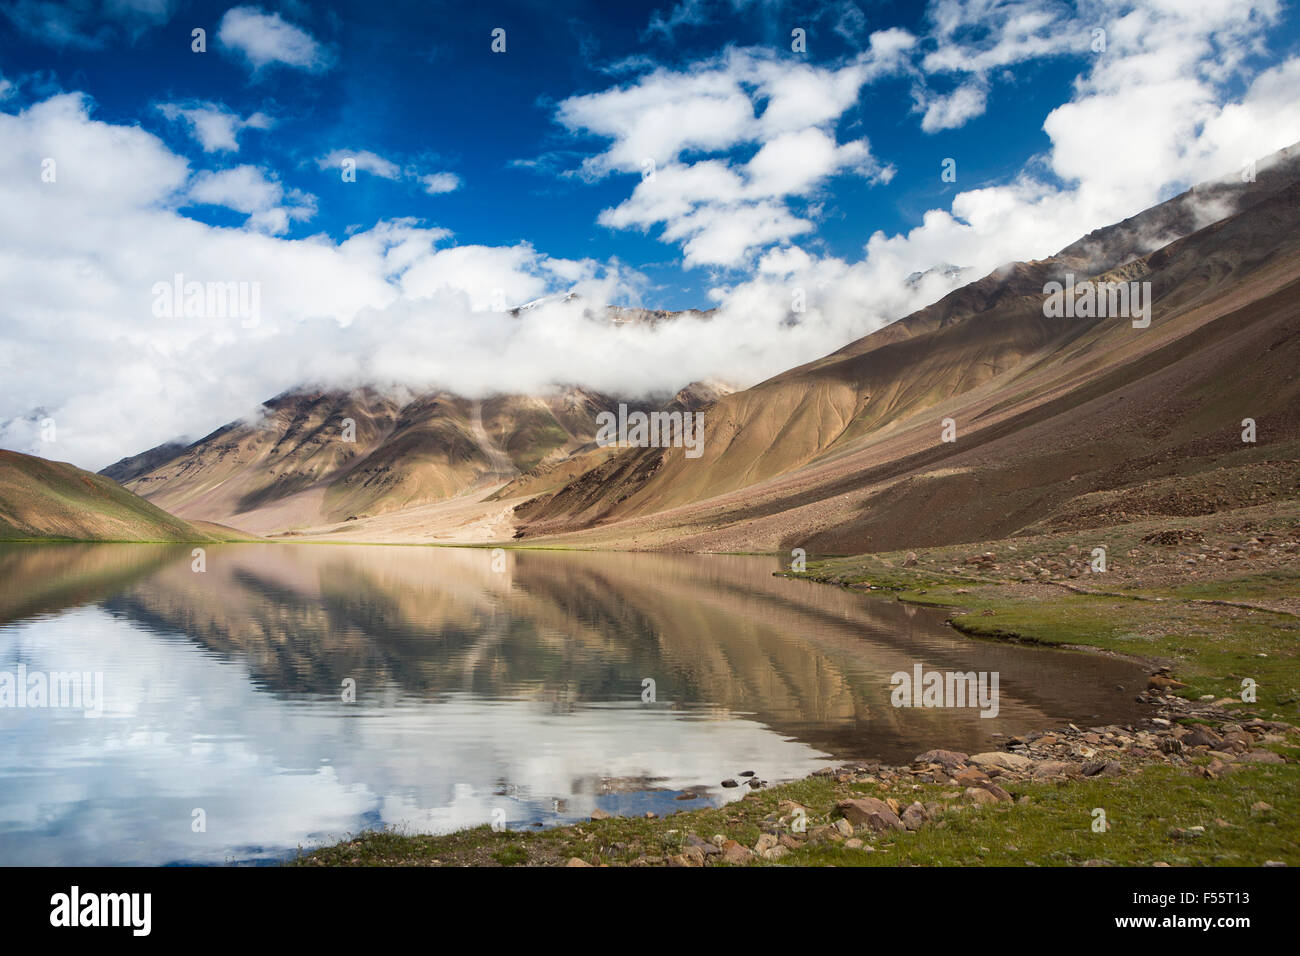 India, Himachal Pradesh, Spiti, Chandra Taal, Full Moon Lake, lake shore early morning - Stock Image